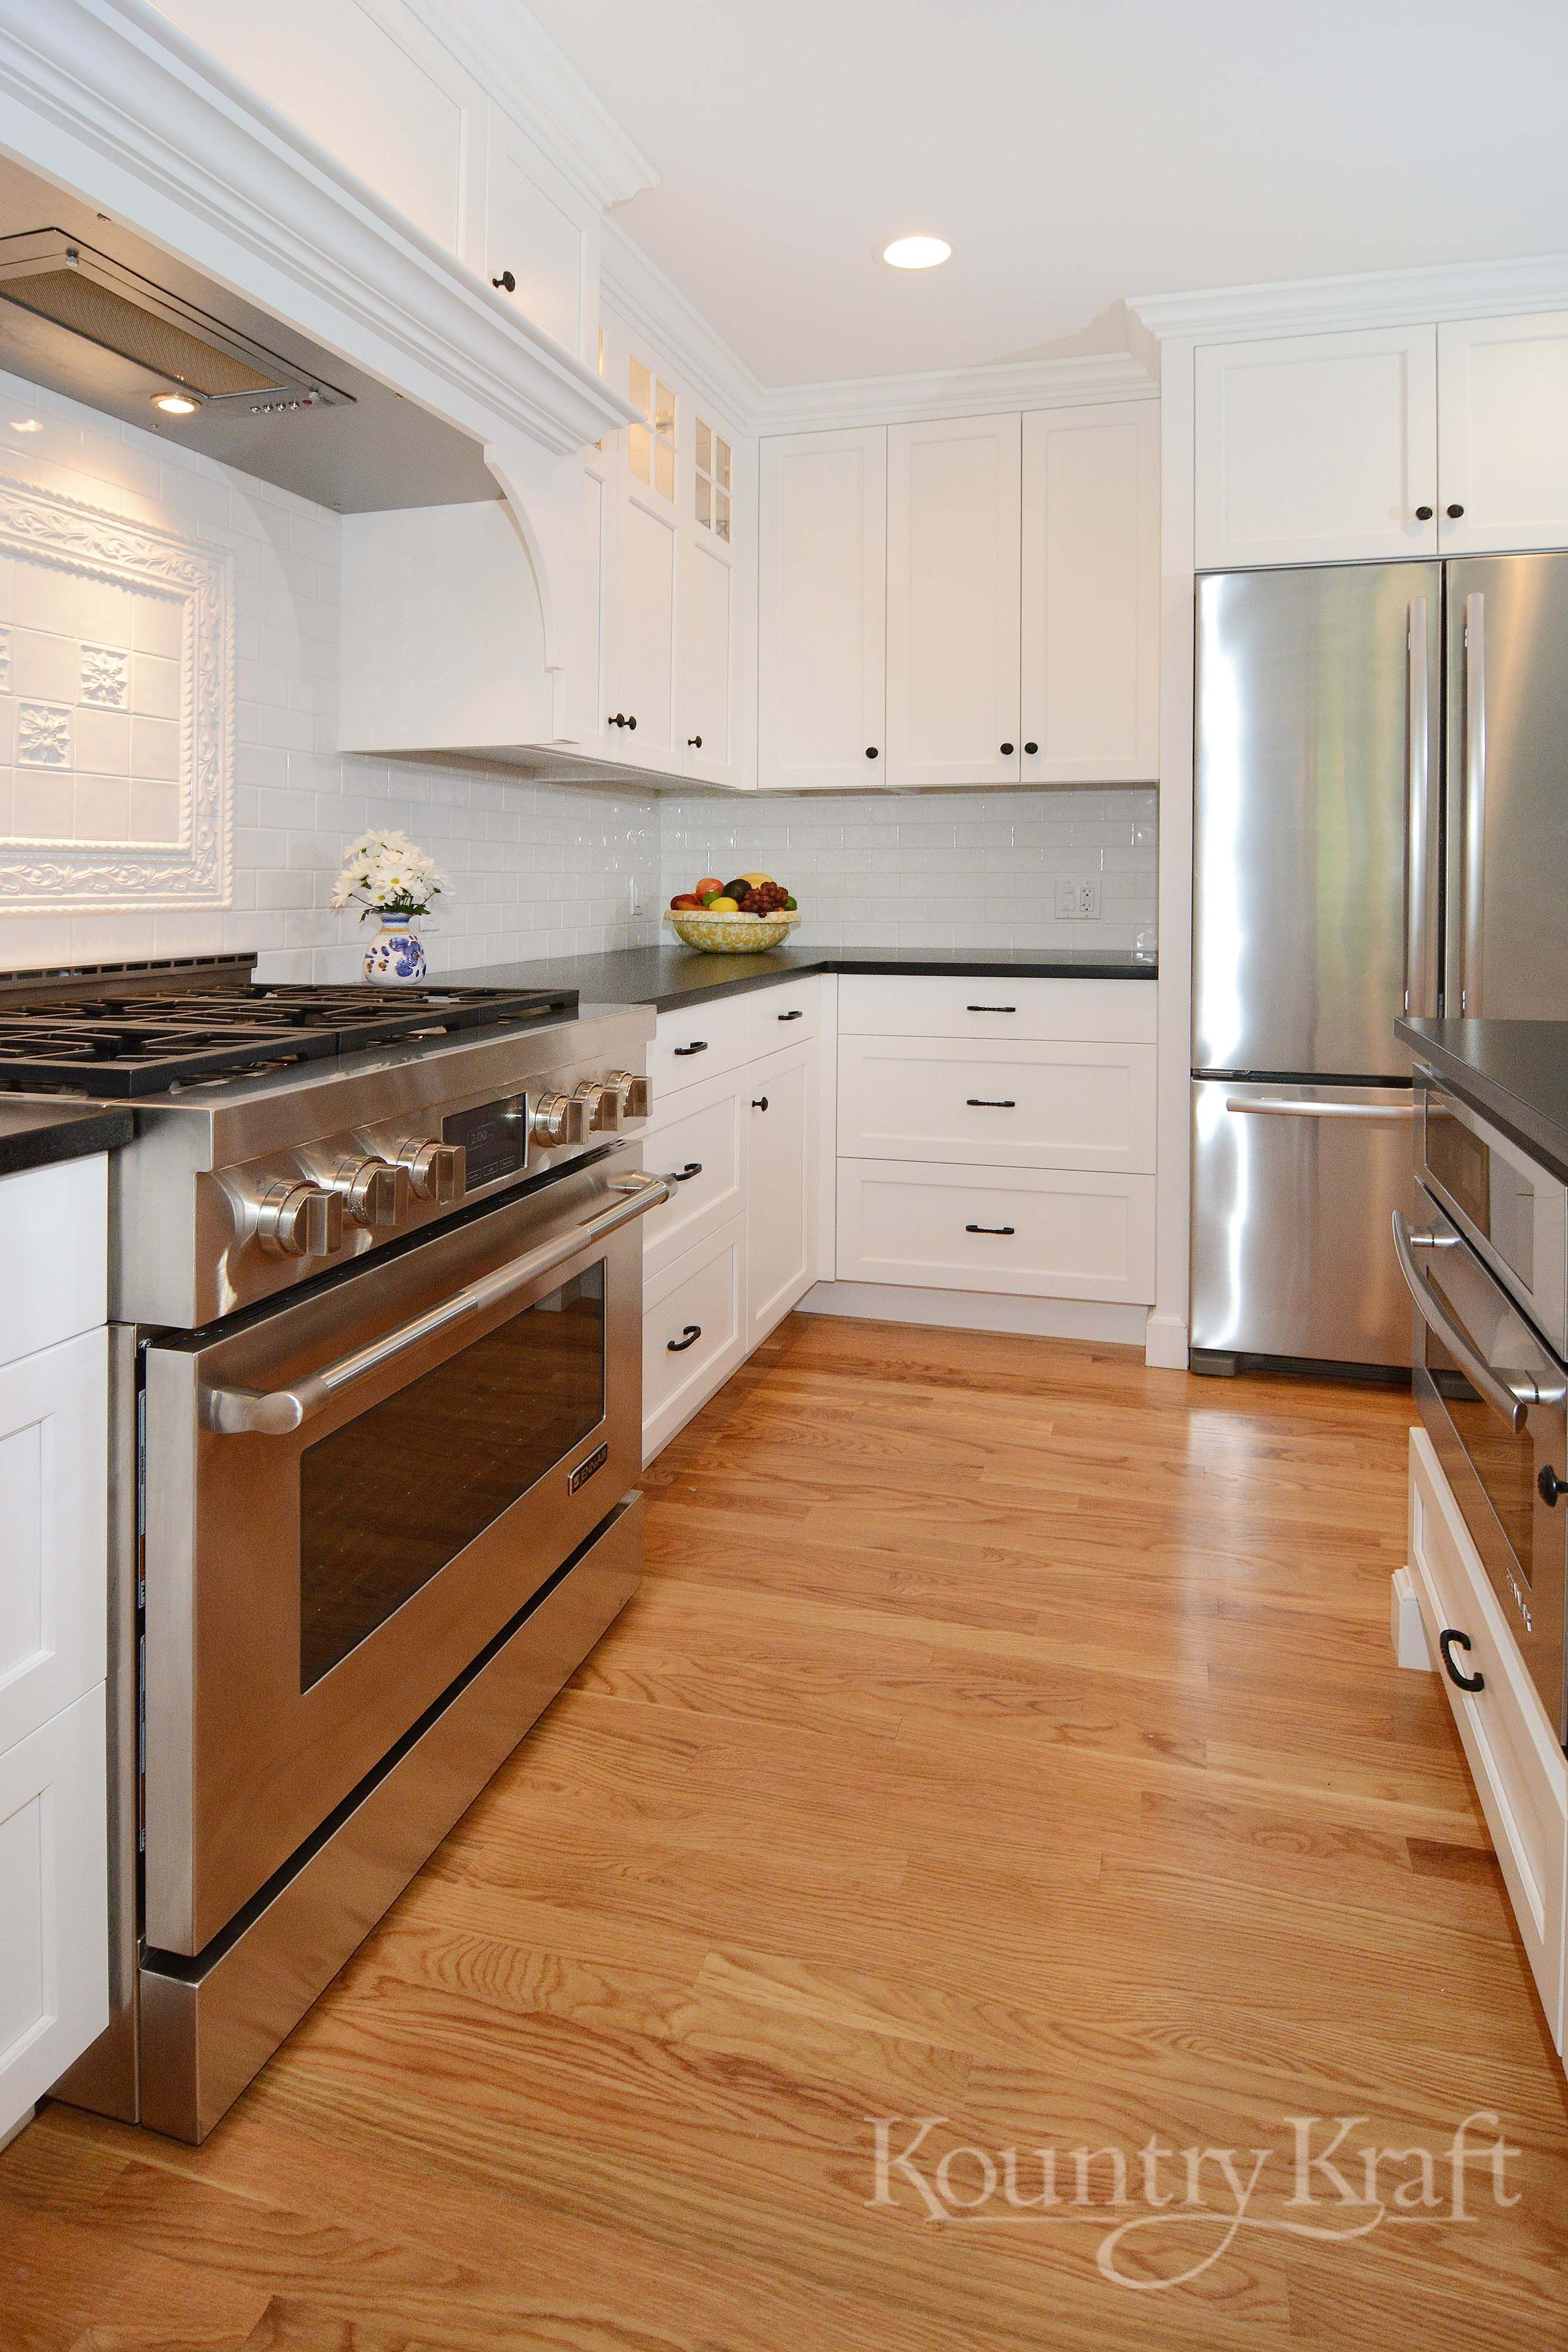 Custom Kitchen Cabinets Designed By Justin Sachs Of Stonington Cabinetry Desi Custom Kitchen Cabinets Design Custom Kitchen Cabinets Kitchen Cabinetry Design